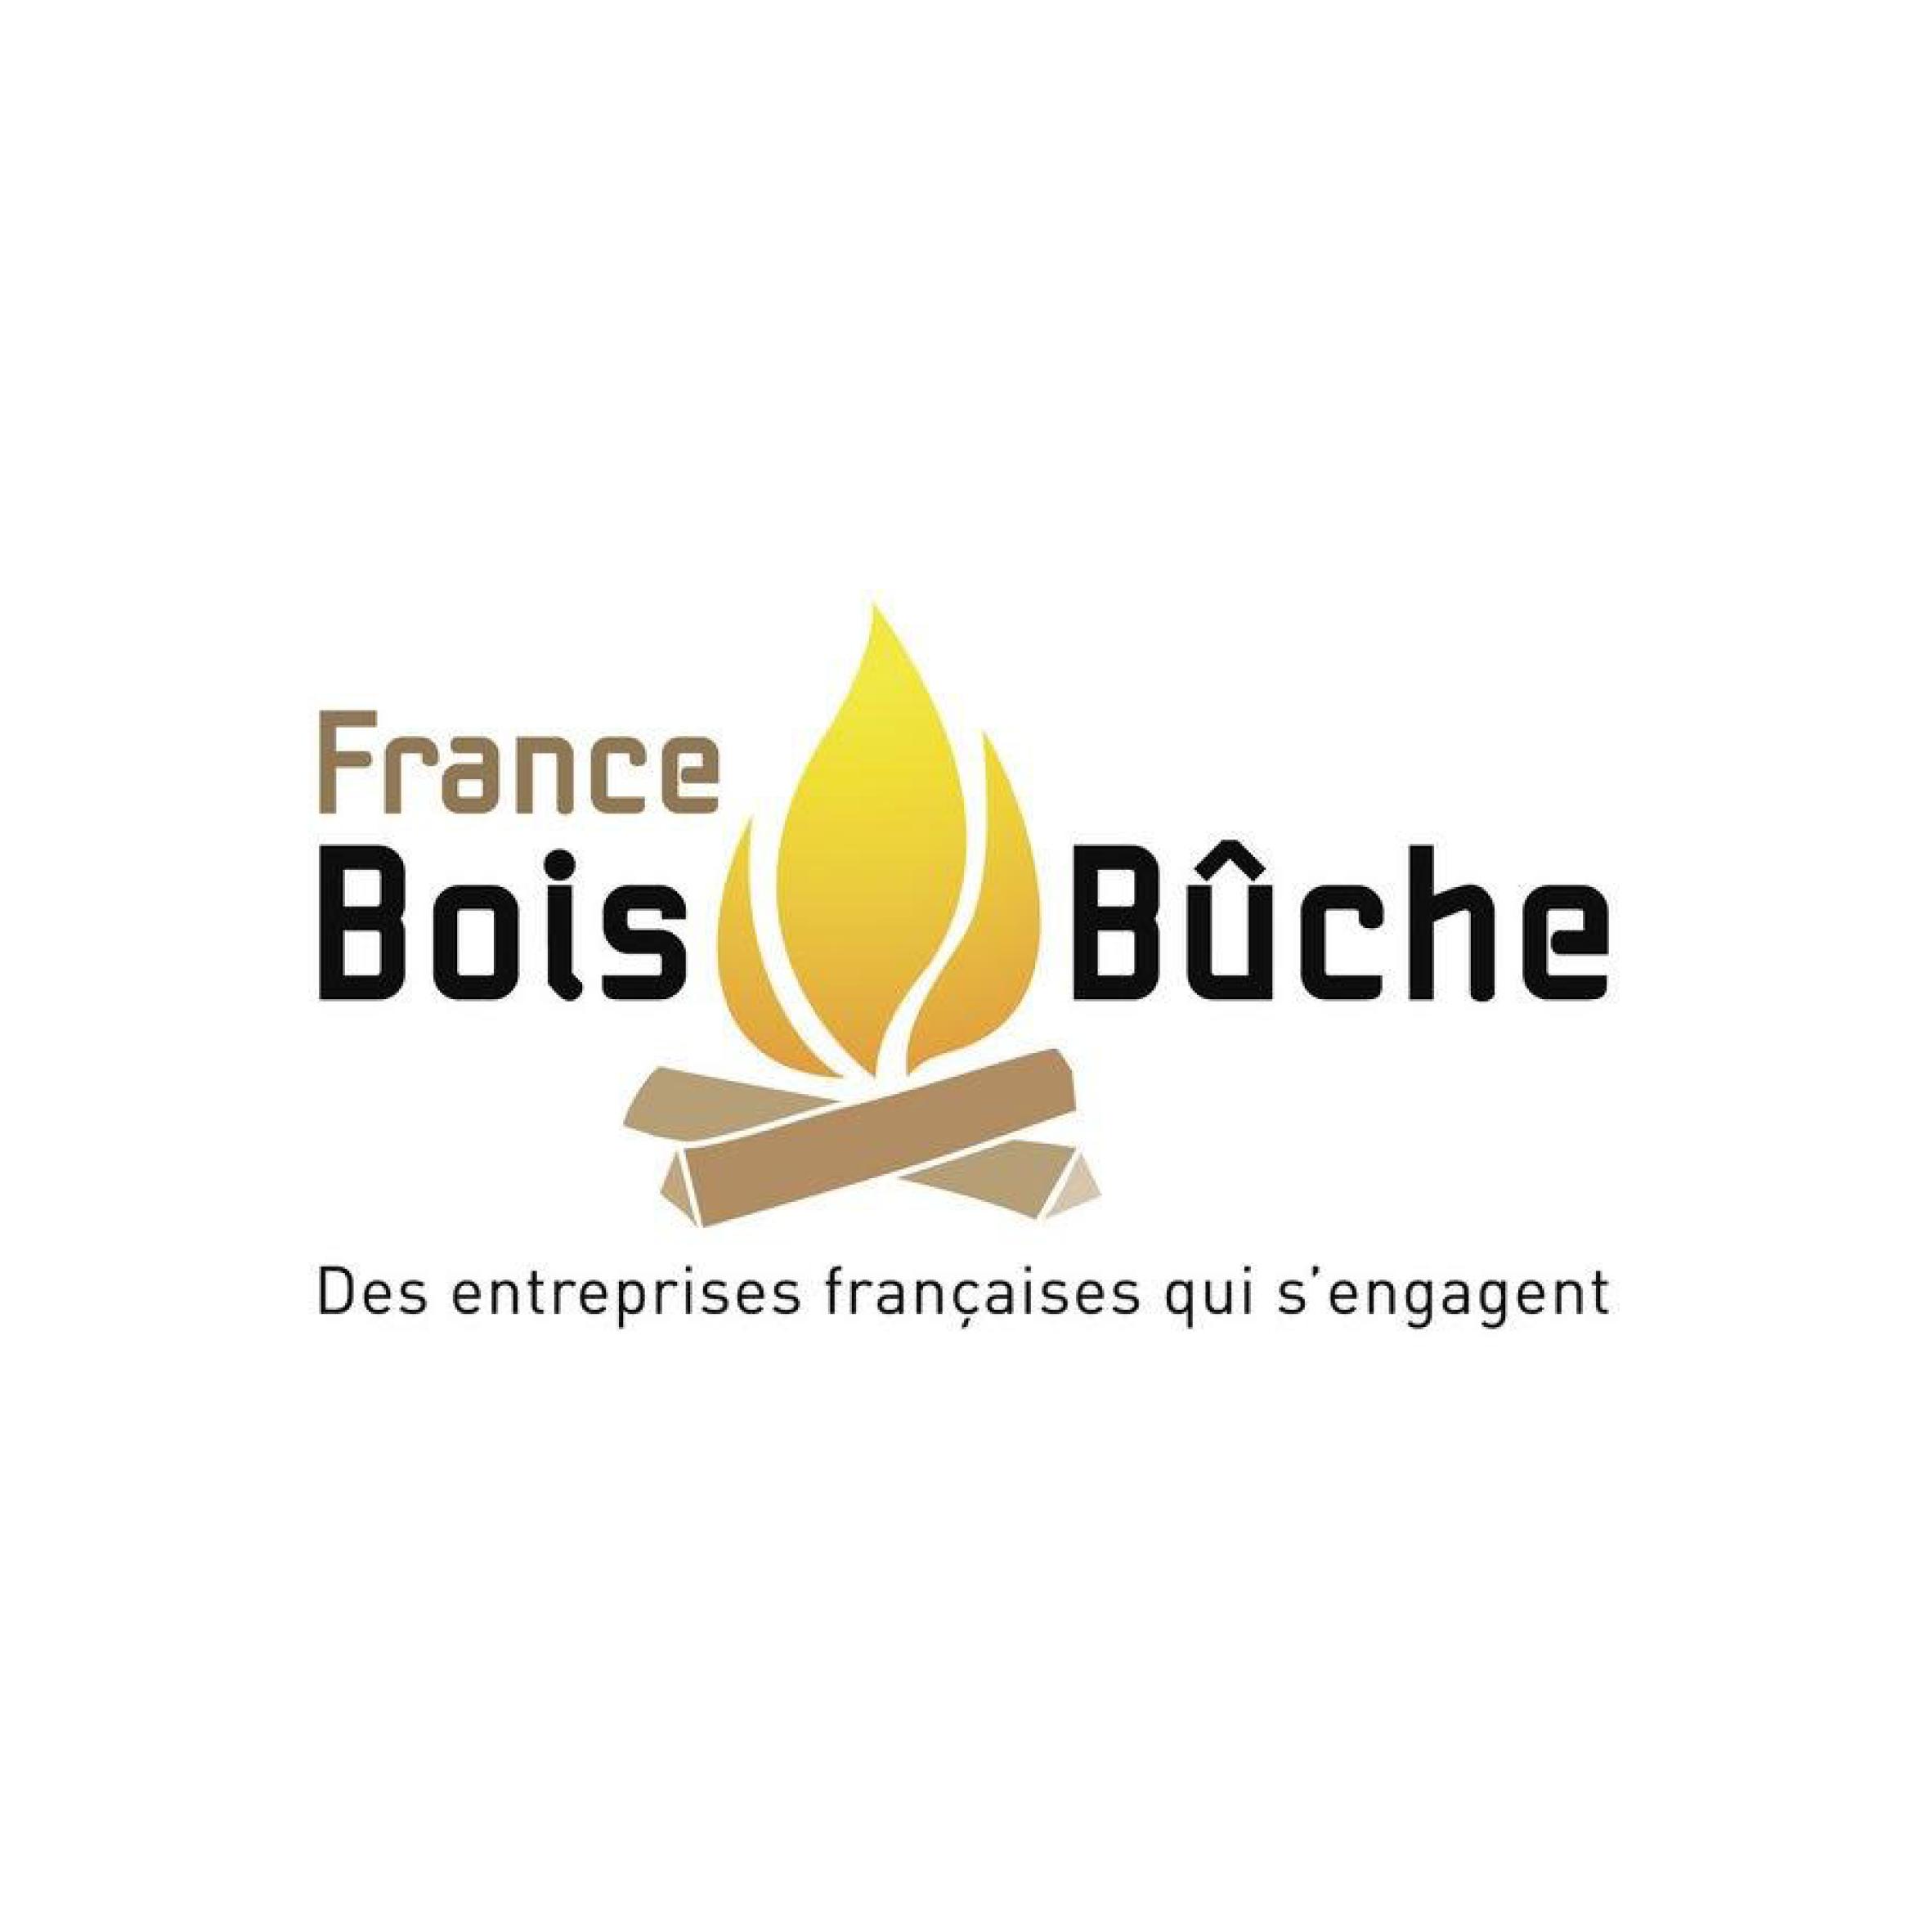 france-bois-buche